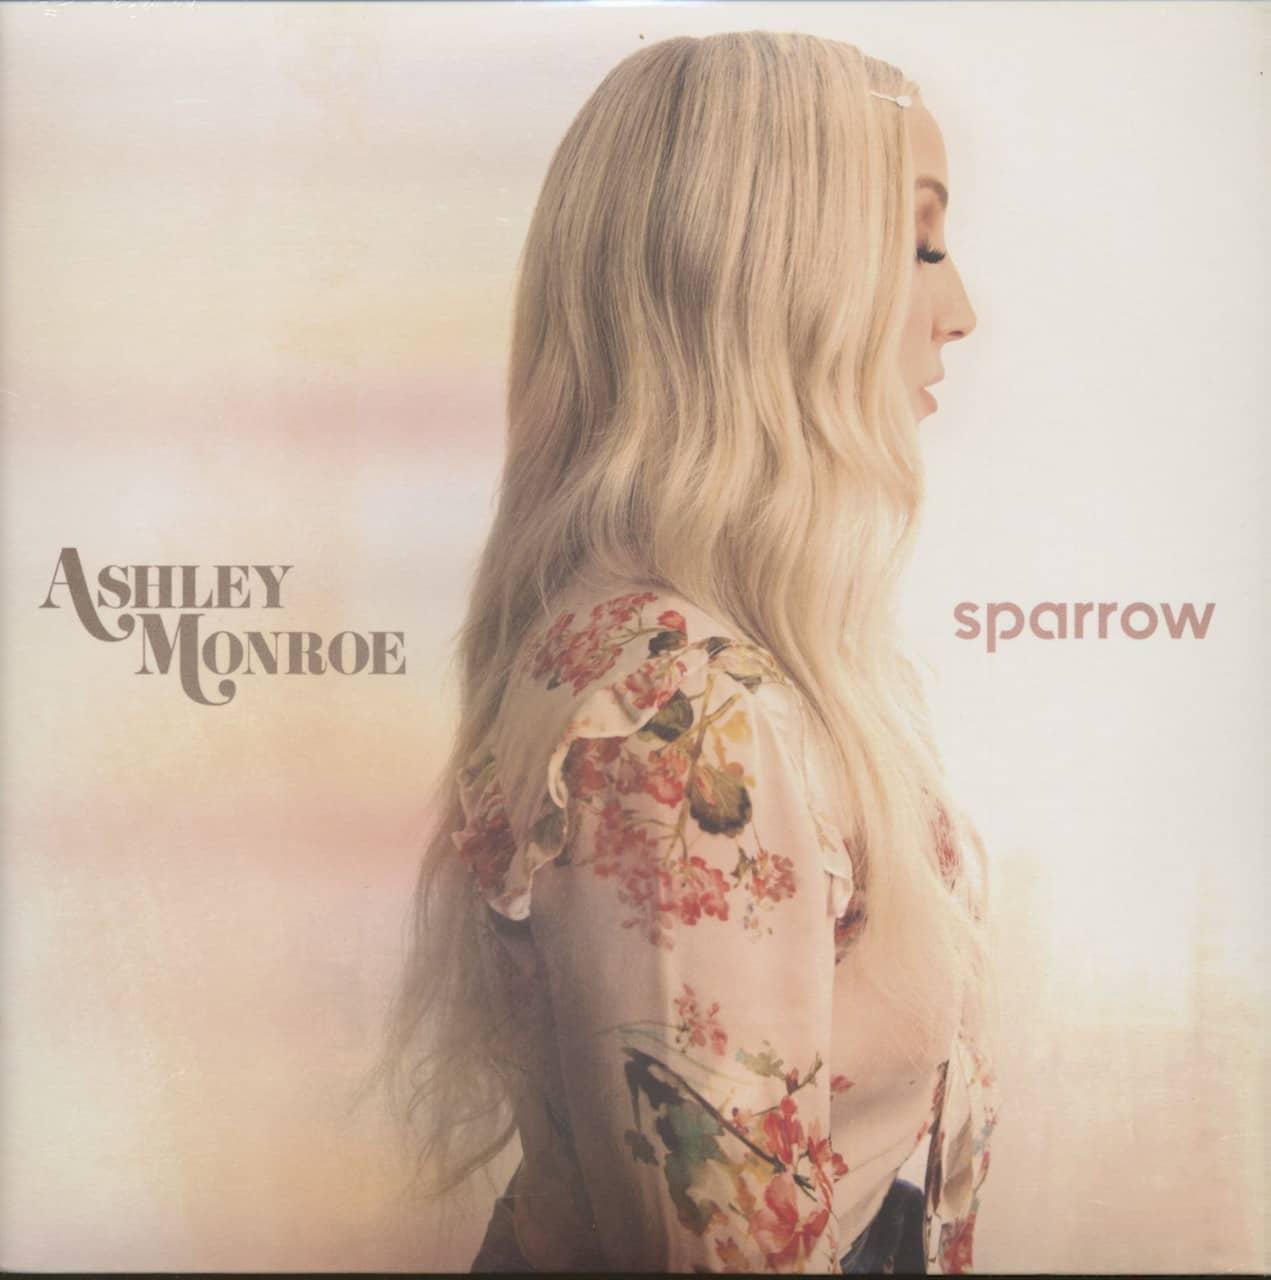 Ashley Monroe - Sparrow (LP)